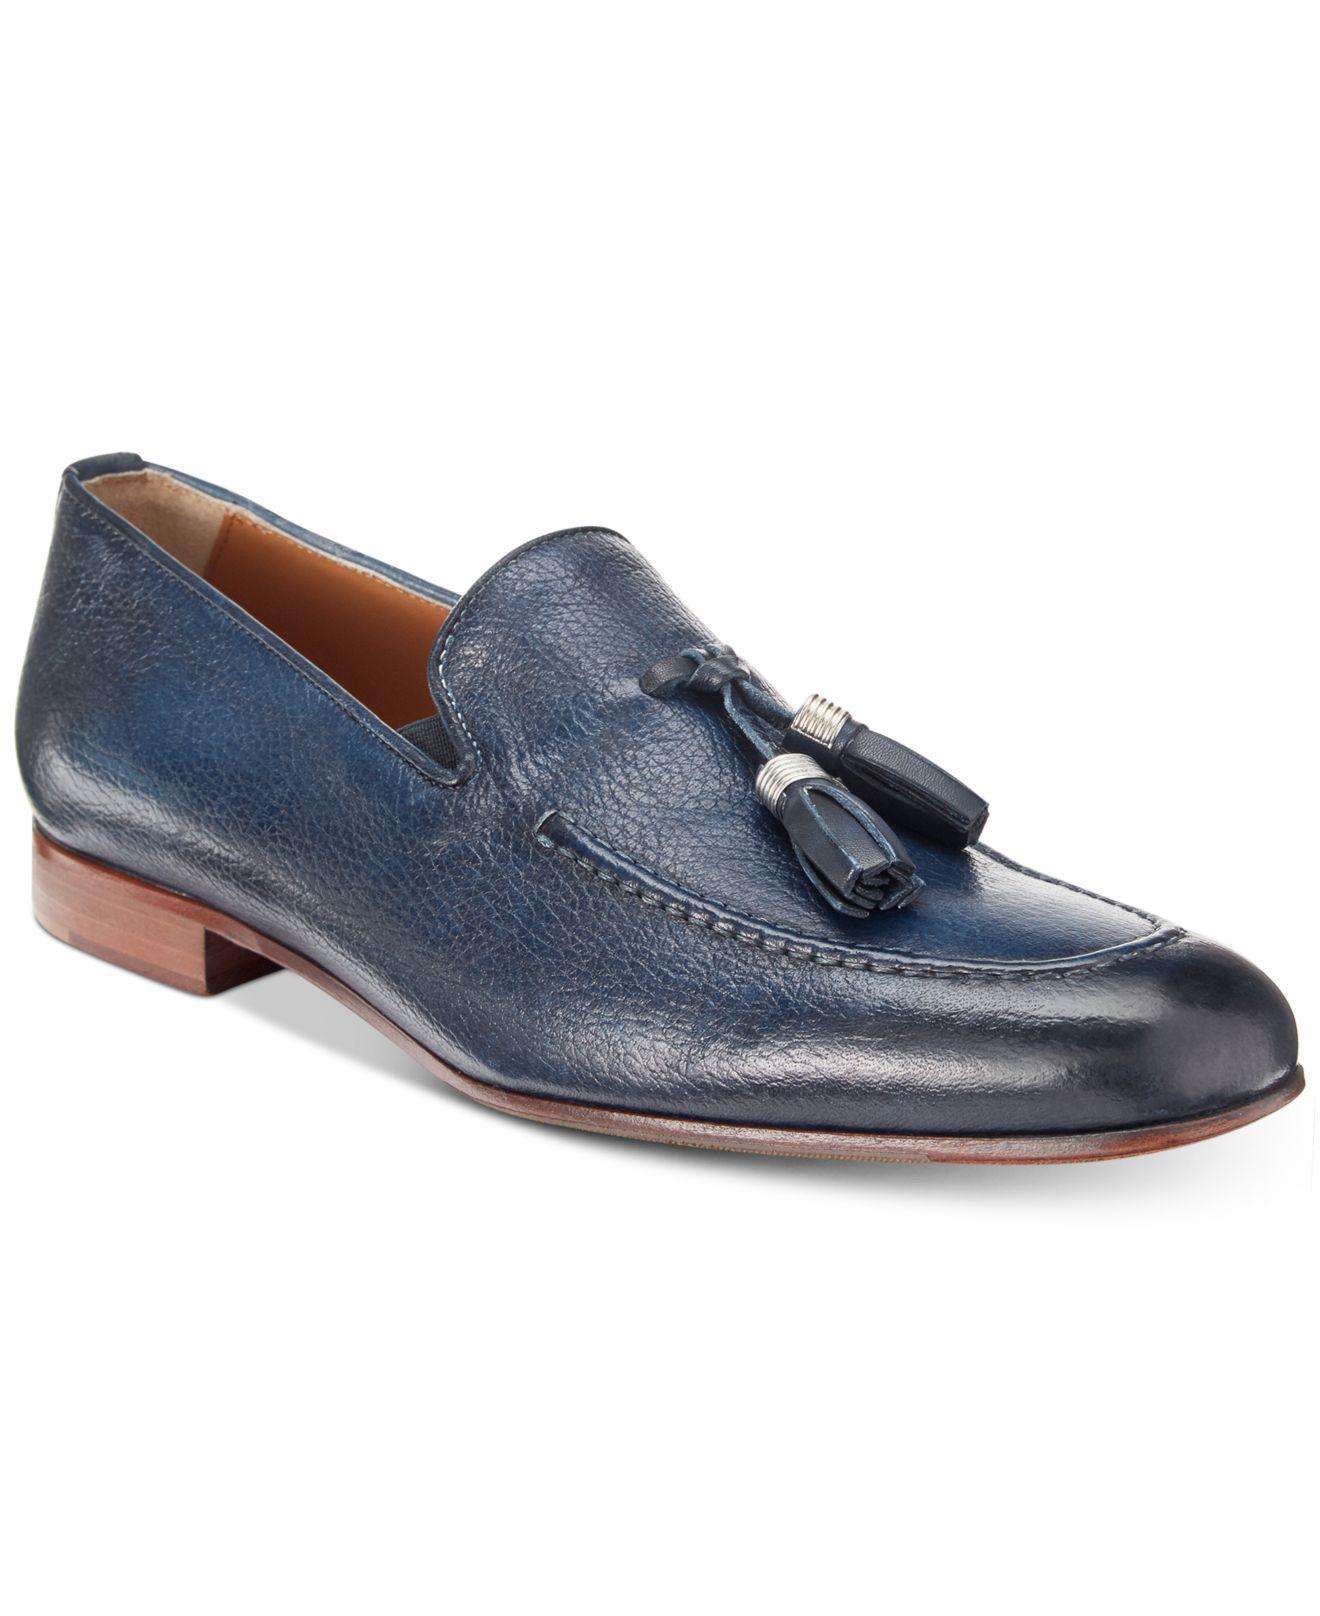 Donovan Italian Leather Tassel Loafer Kenneth Cole 9K3coS